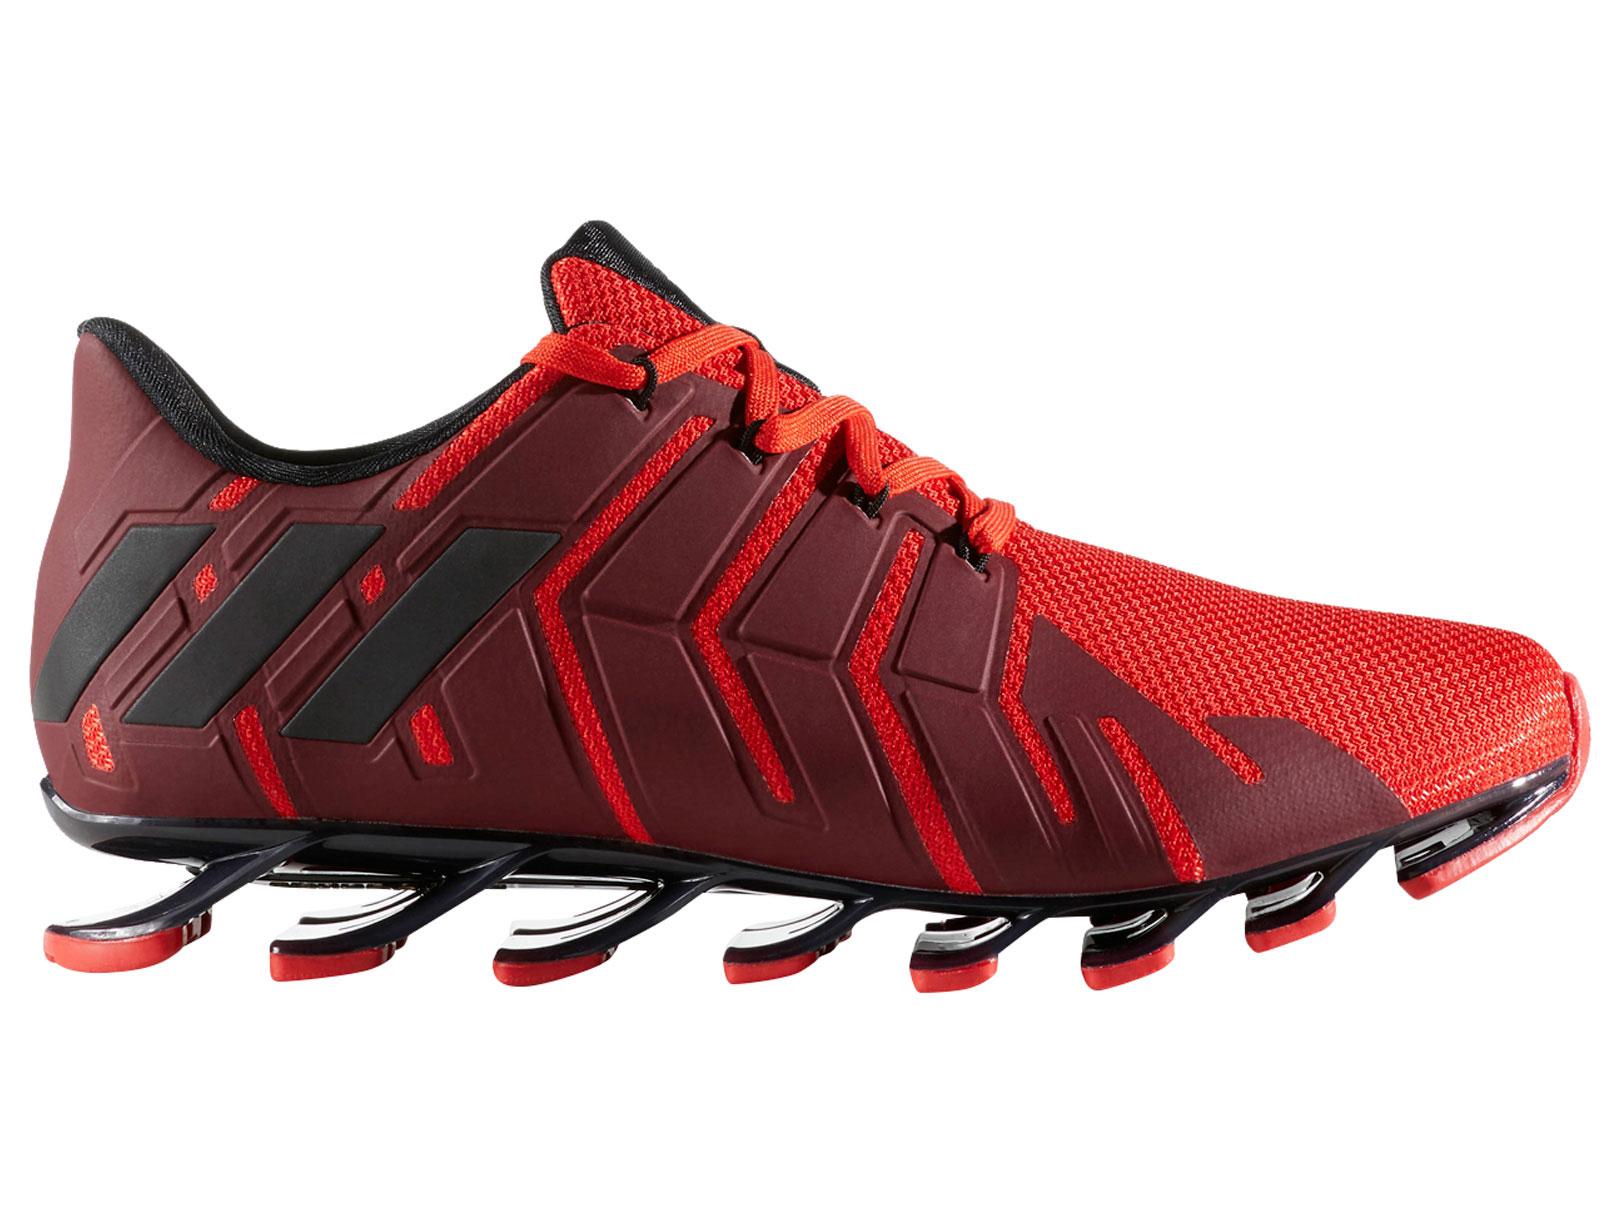 Liverpool: Tenis adidas springblade $1,519